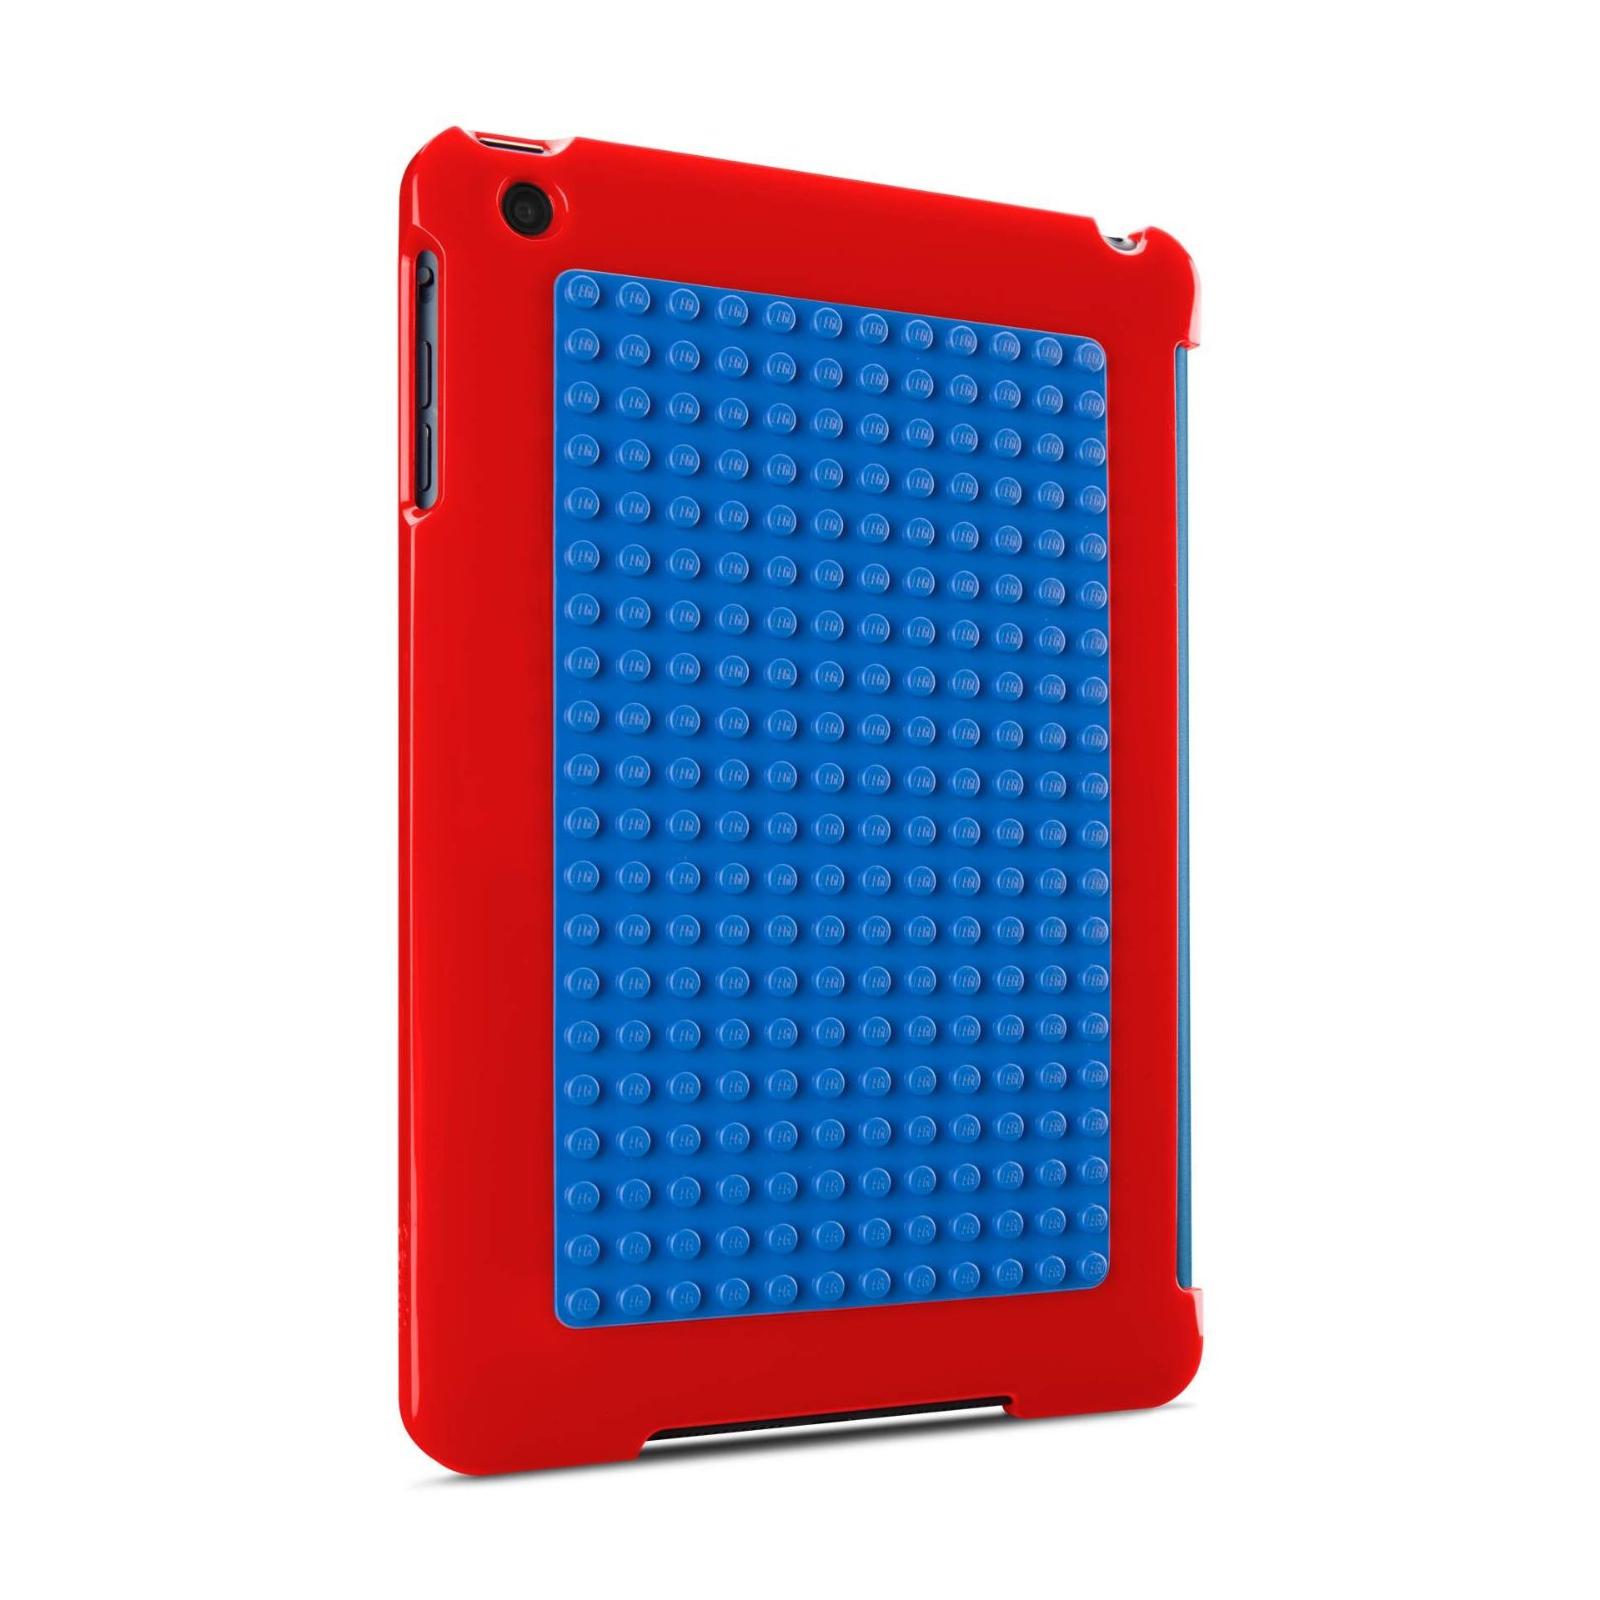 Чехол для планшета Belkin iPad mini LEGO Builder Case Red-Blue (F7N110B2C02) изображение 4